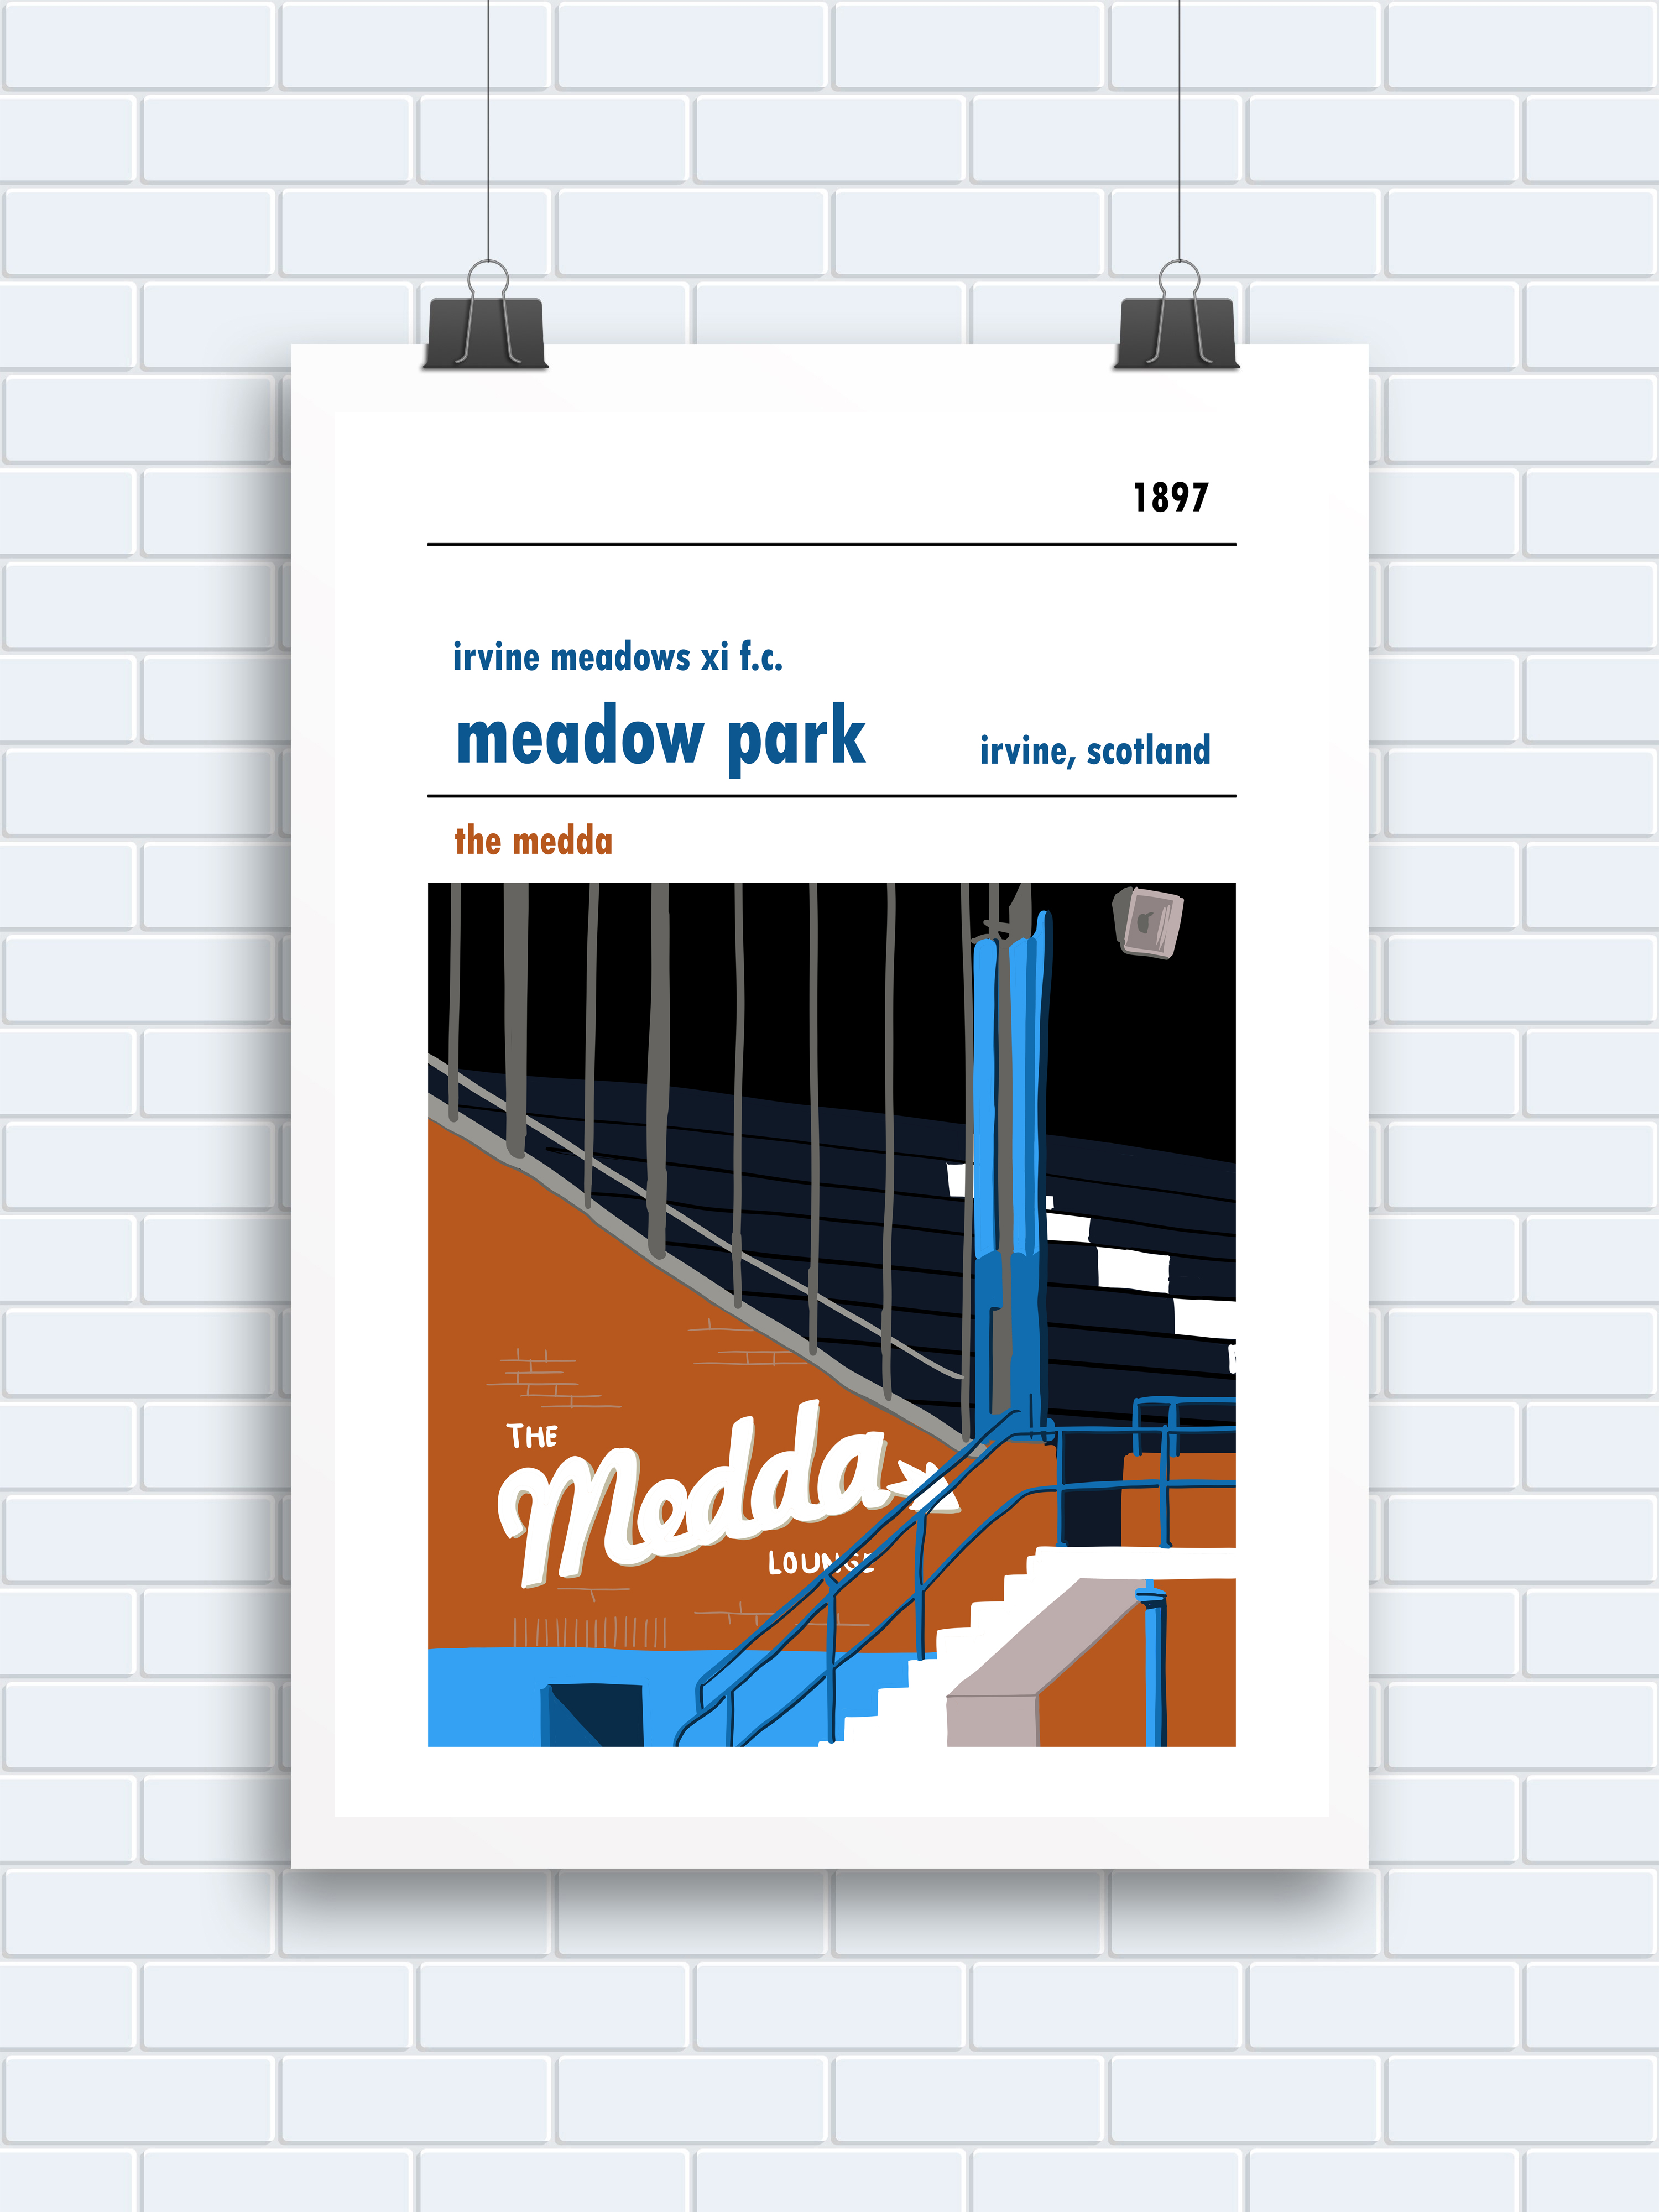 Meadow Park, Irvine